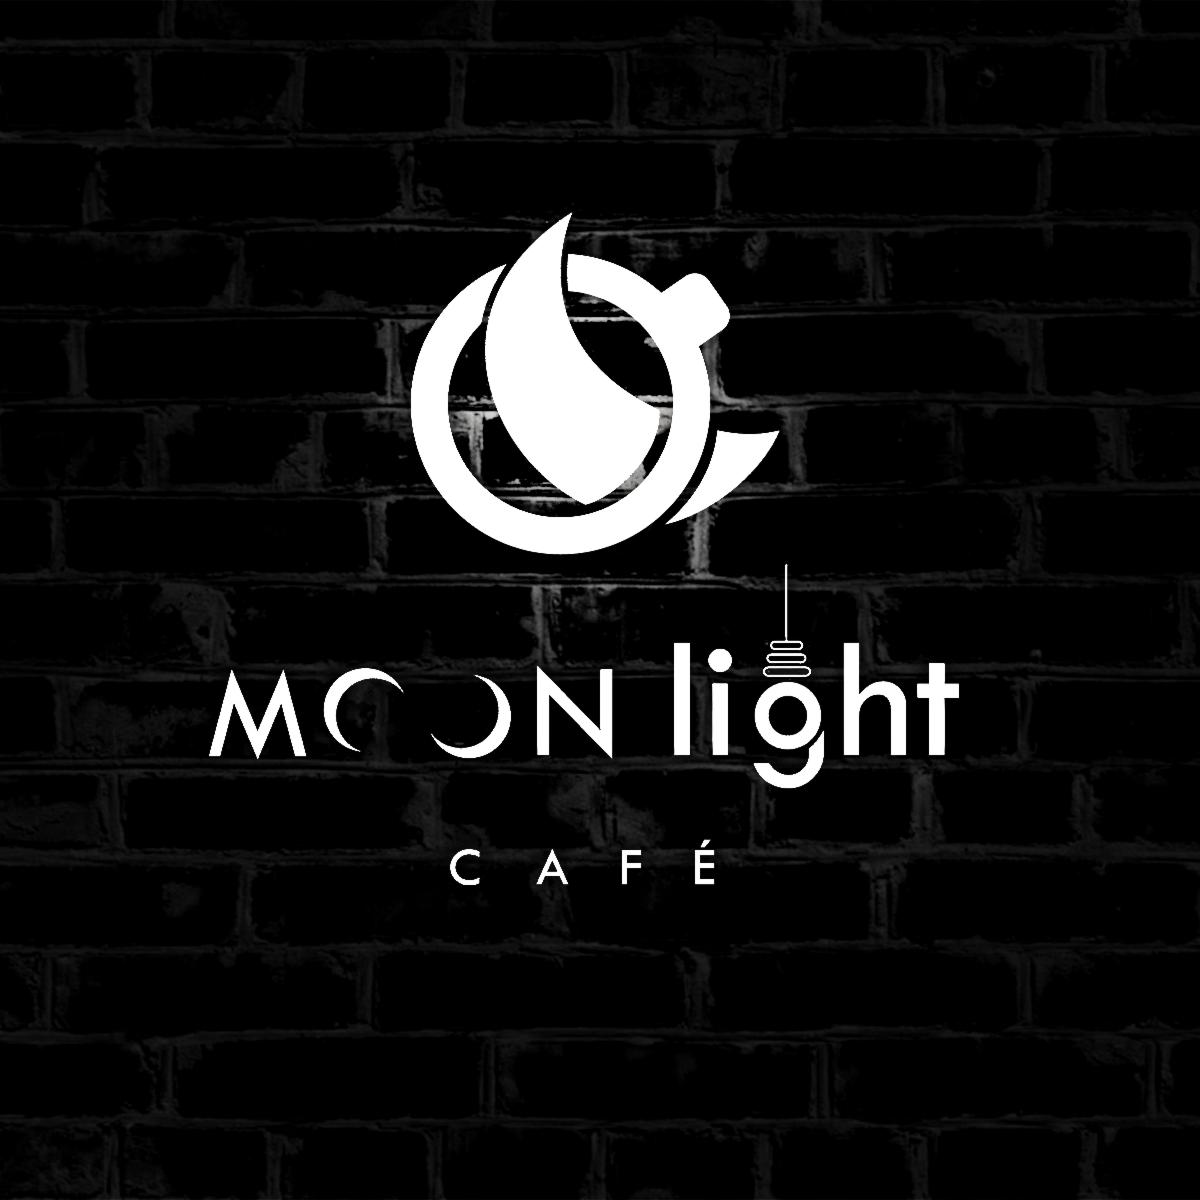 cafemoonlight